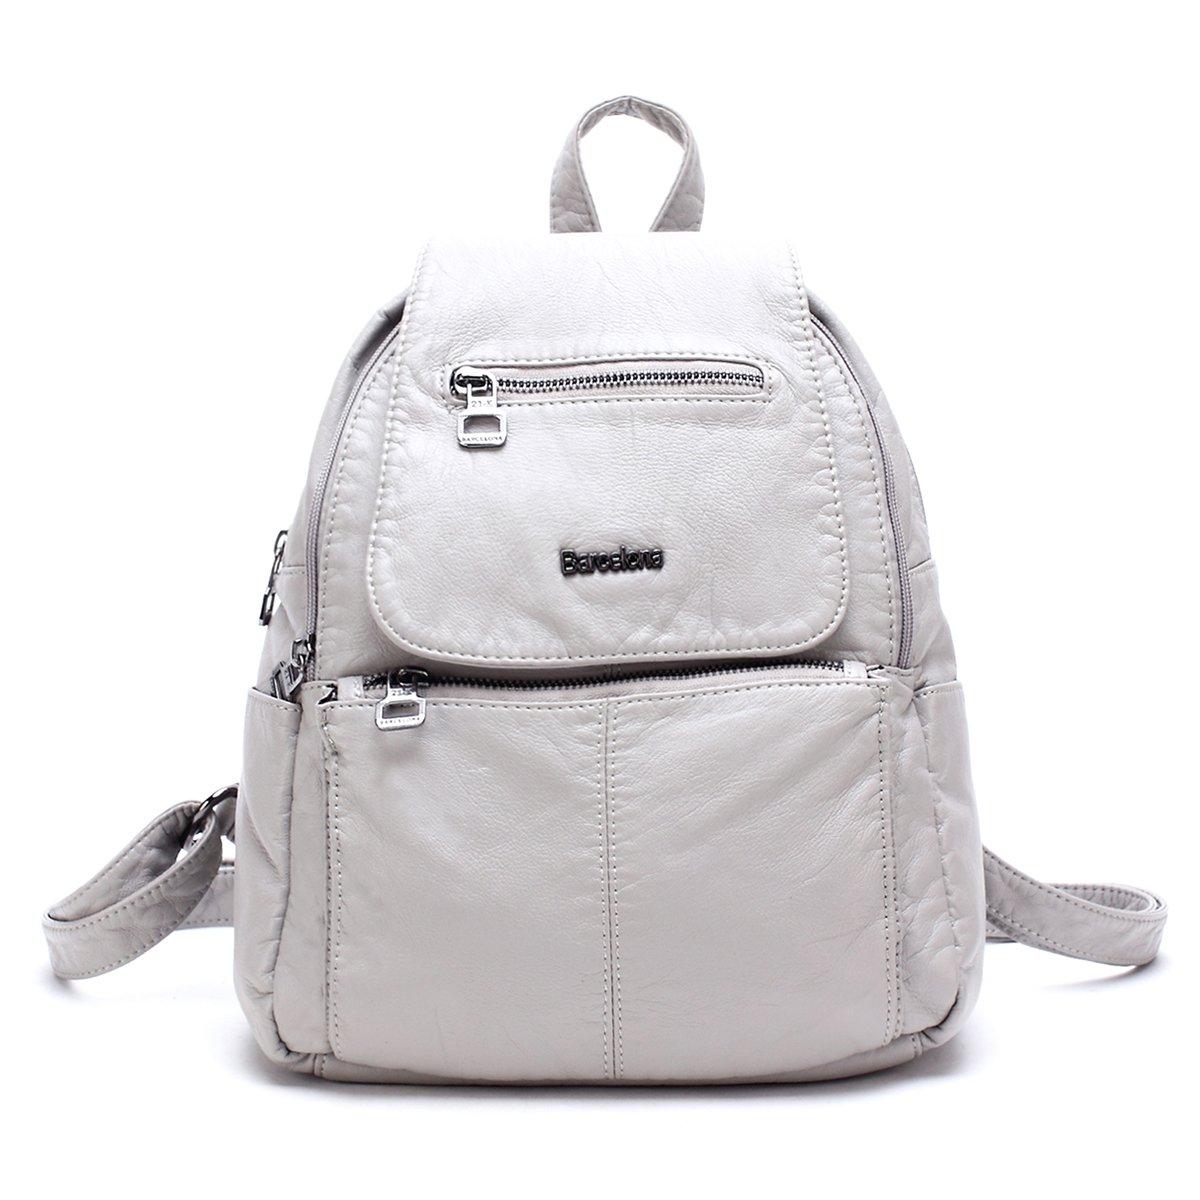 21KBARCELONA High Quality Washed PU Leather Backpack Handbag Women XS160433